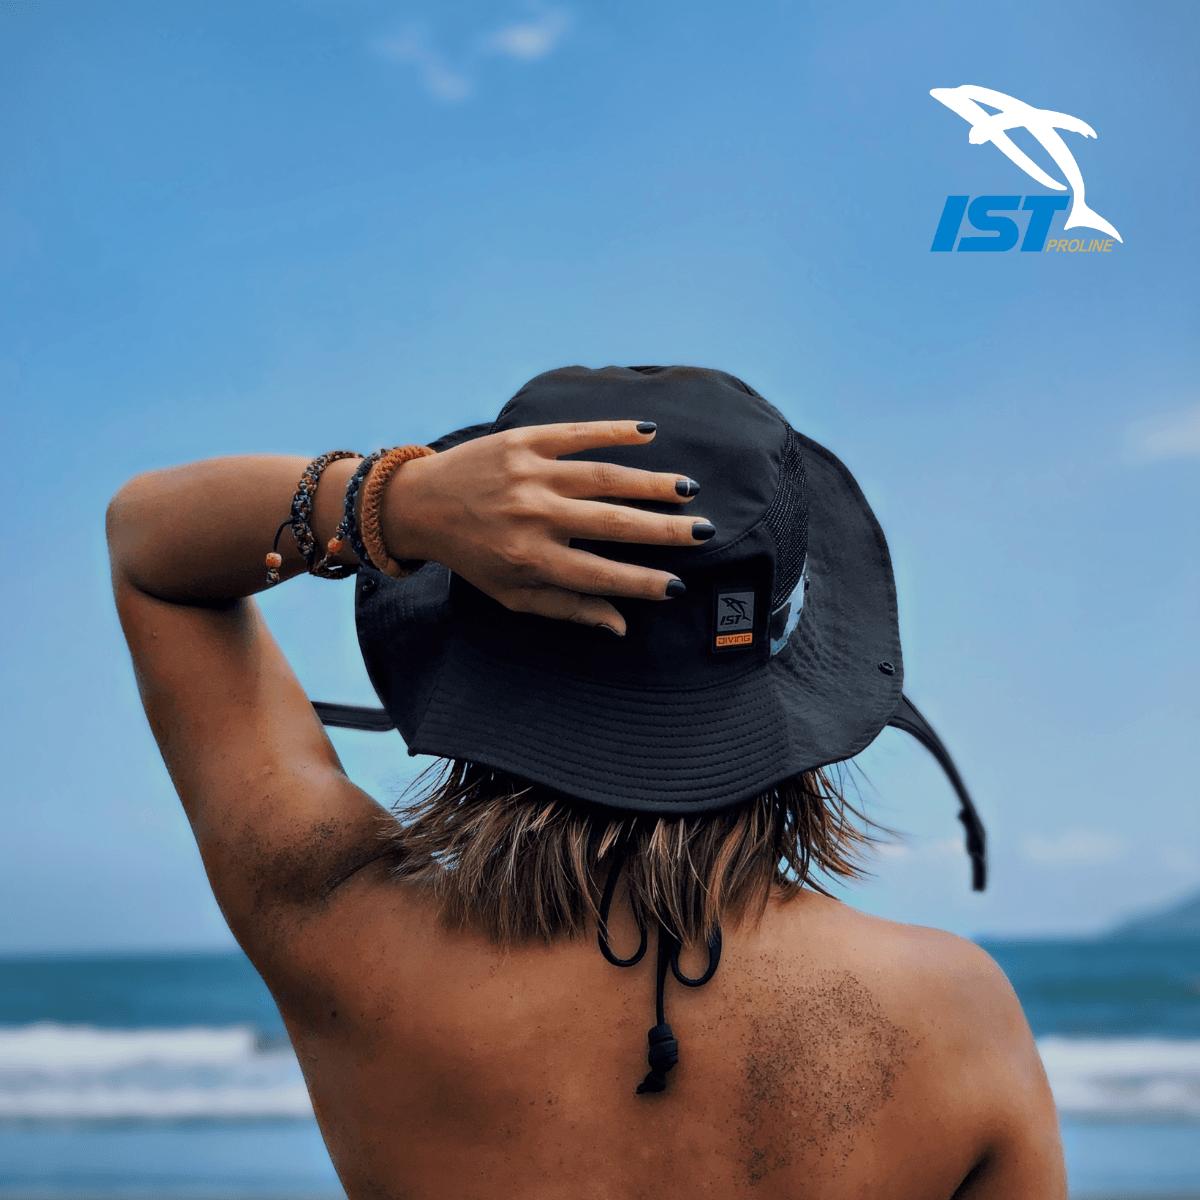 【IST】MIT 漁夫帽 衝浪帽 潛水 自潛 衝浪 溯溪 SUP 0